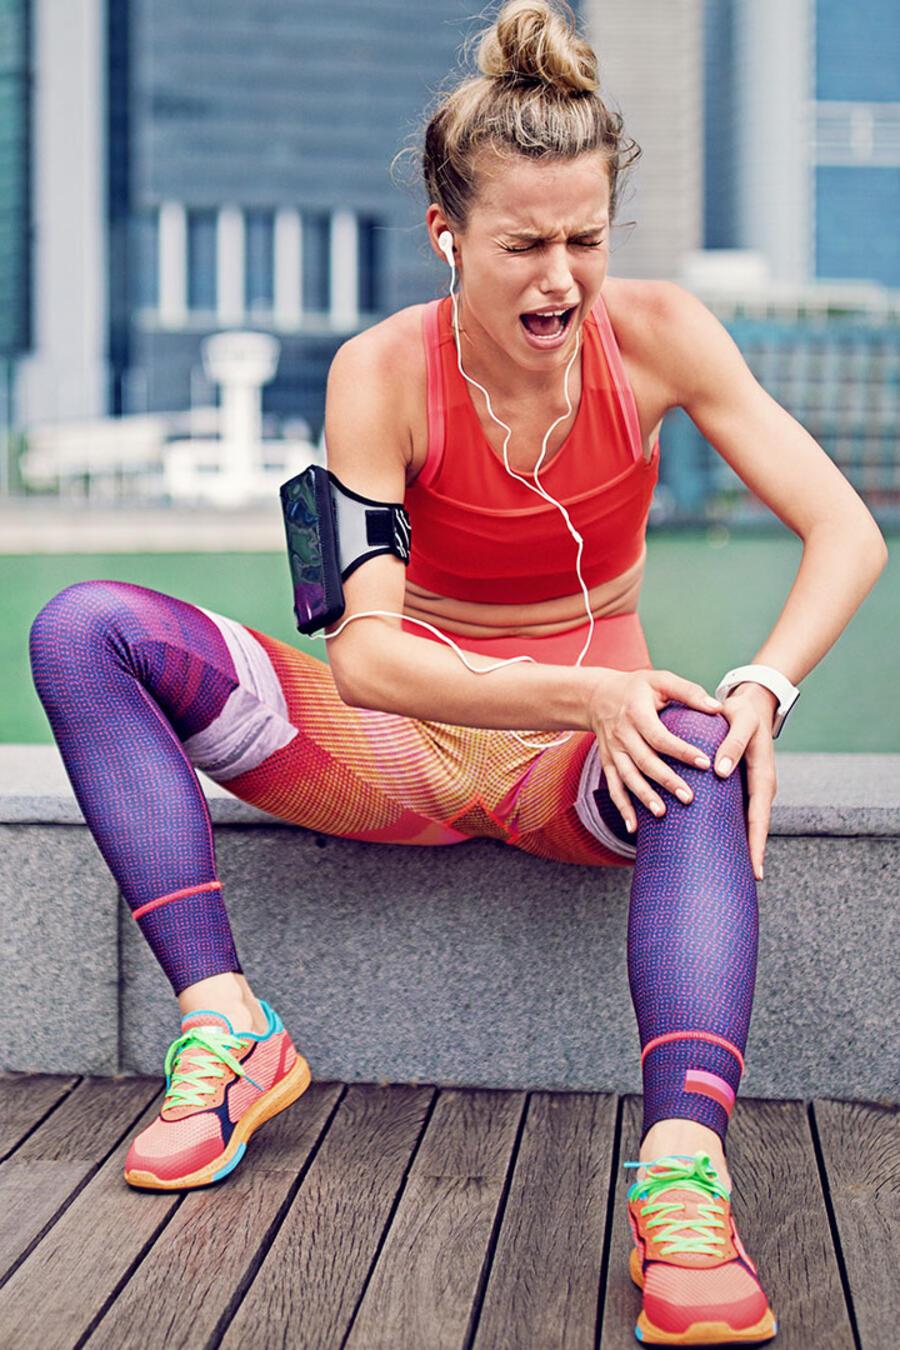 Lesiones al correr